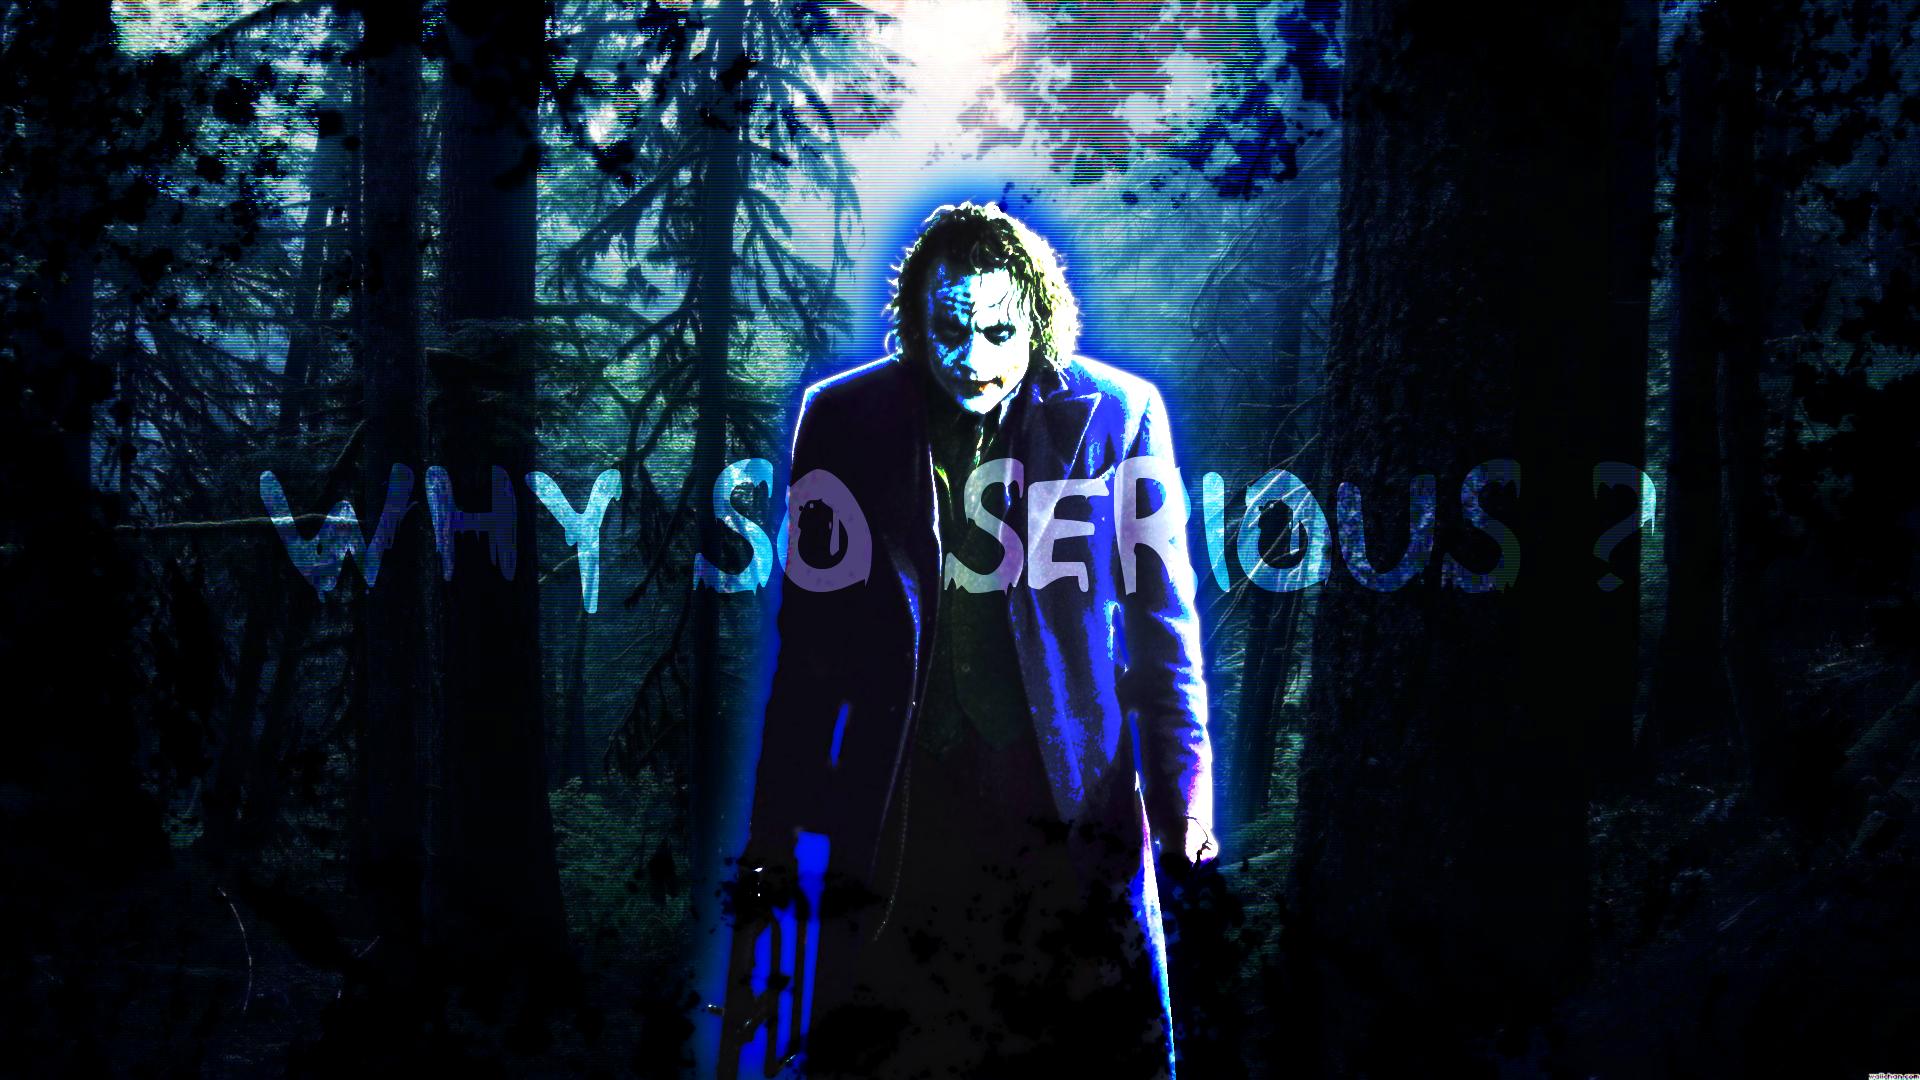 Joker (Why So Serious?) Wallpaper By Hosera On DeviantArt